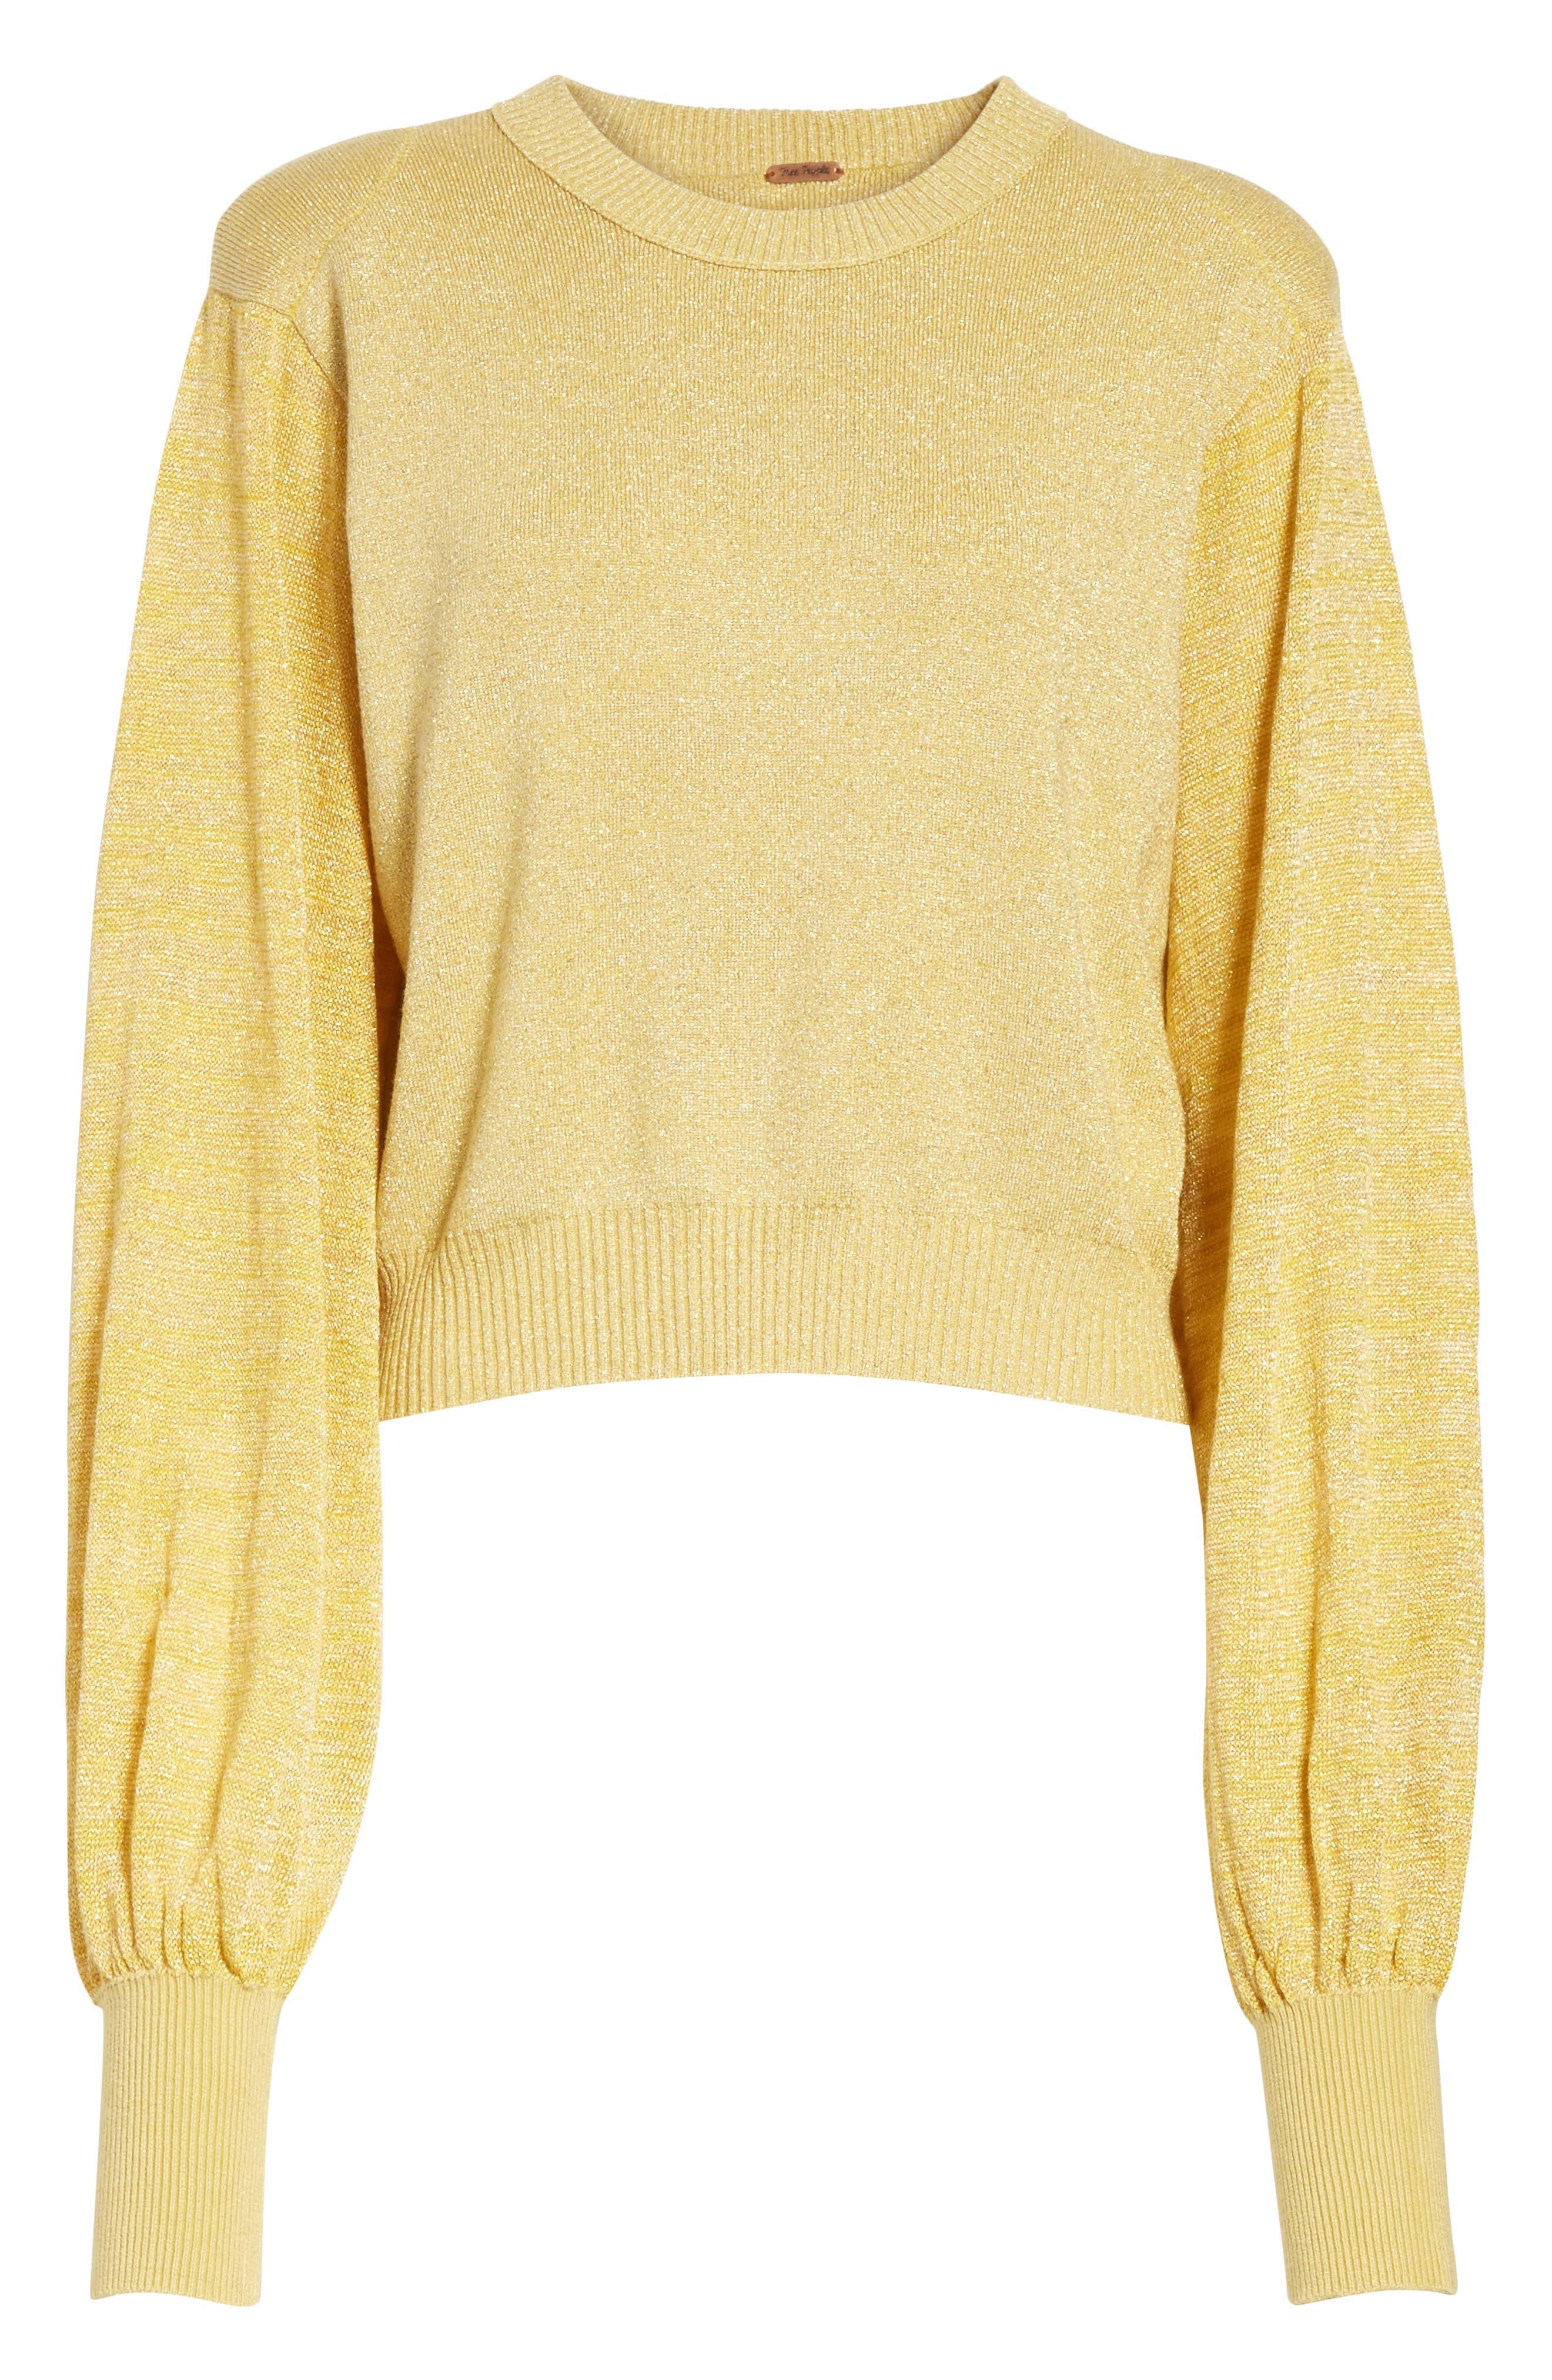 Let it Shine Sweater,                             Alternate thumbnail 17, color,